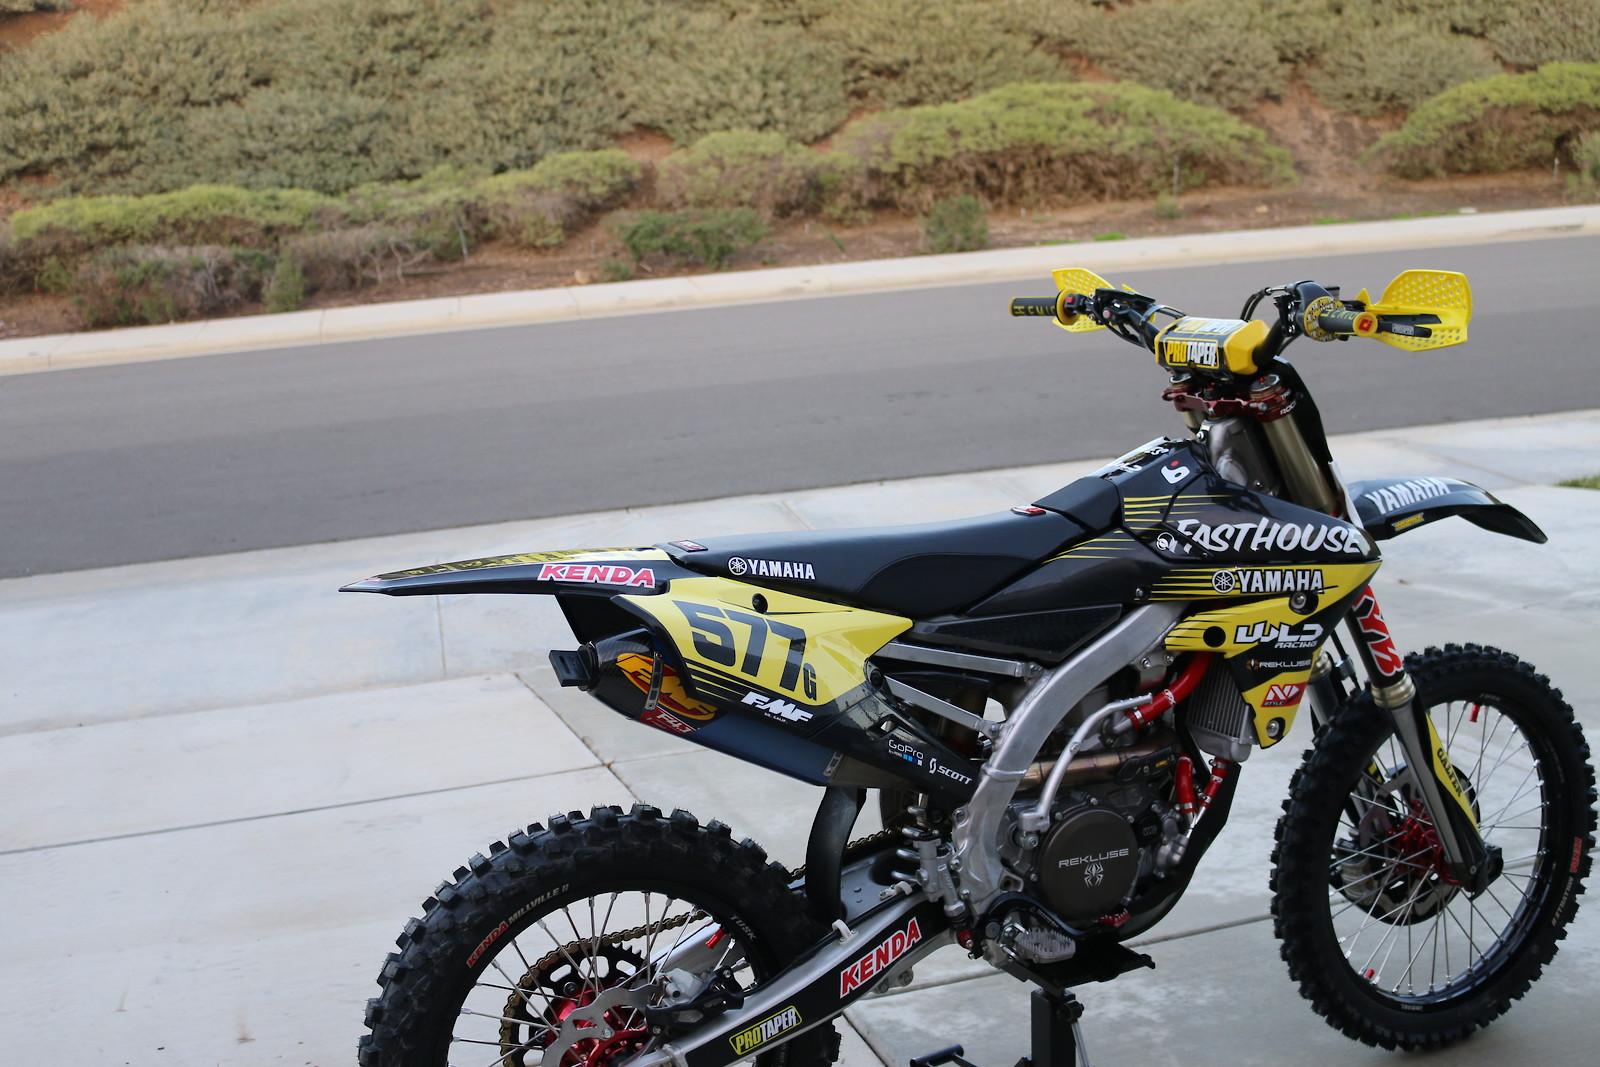 IMG 5893 - WLD - Motocross Pictures - Vital MX